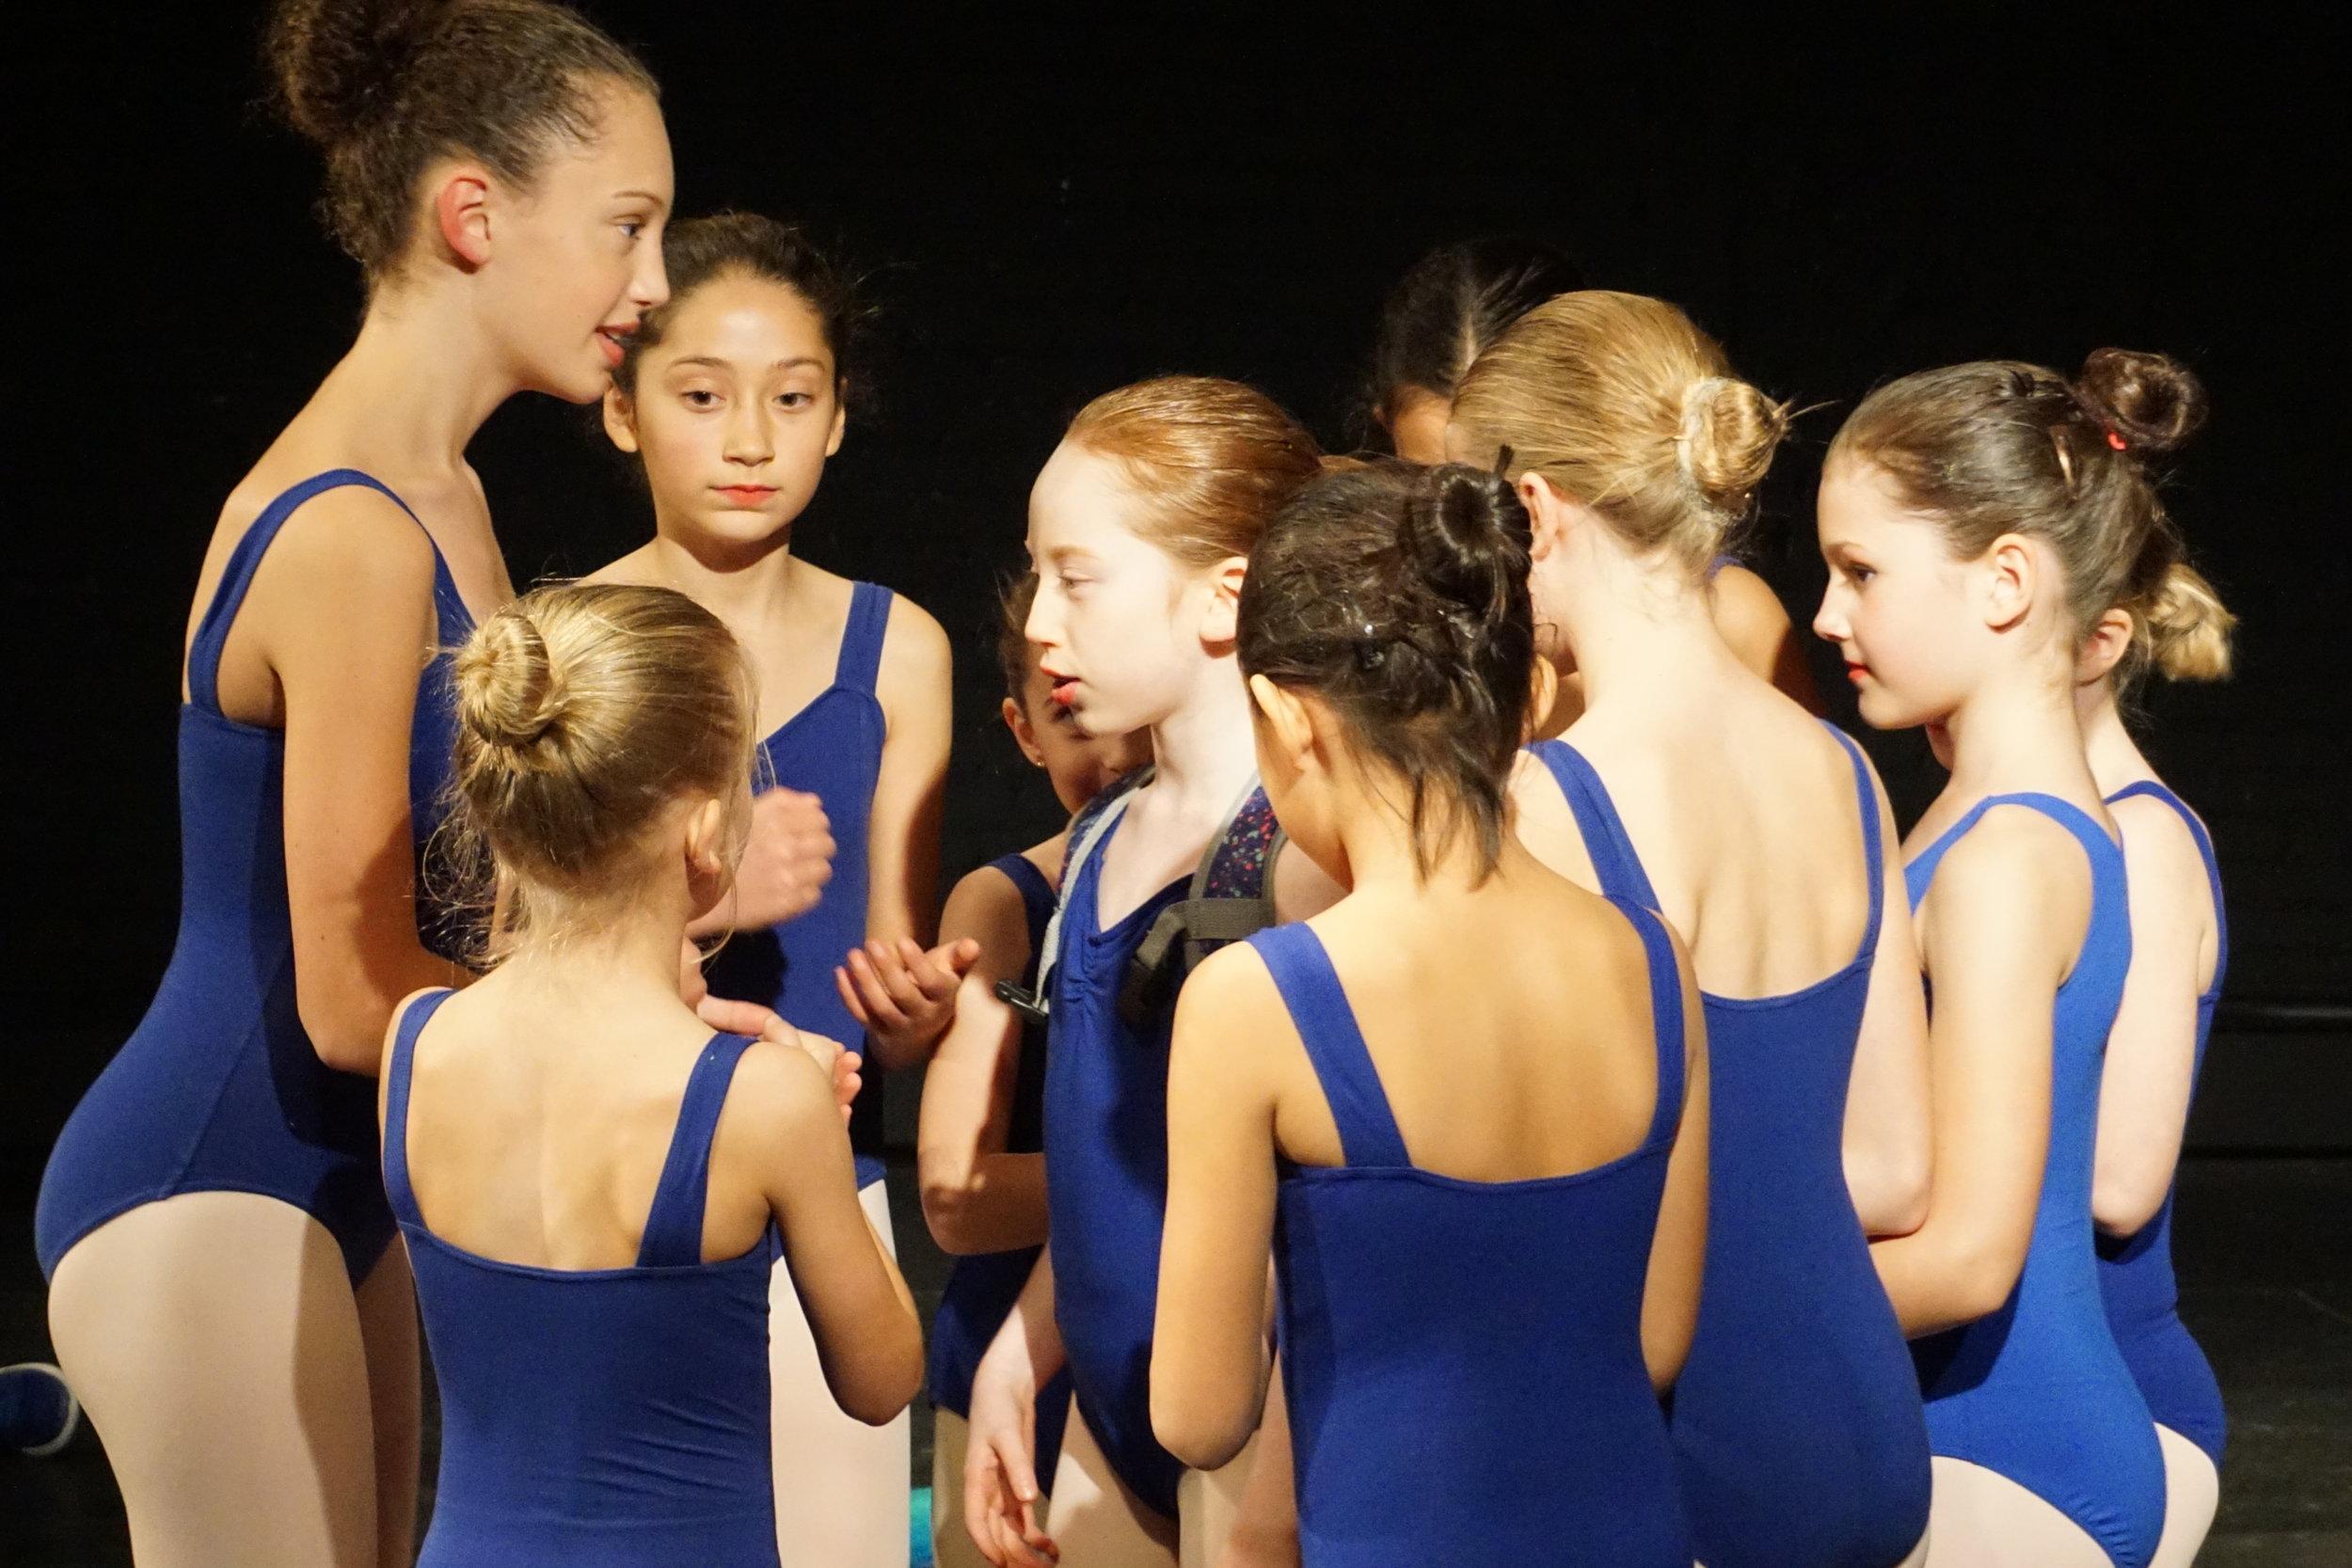 Dancing on the Boulevard - A Jump! Dance Company Fundraiser